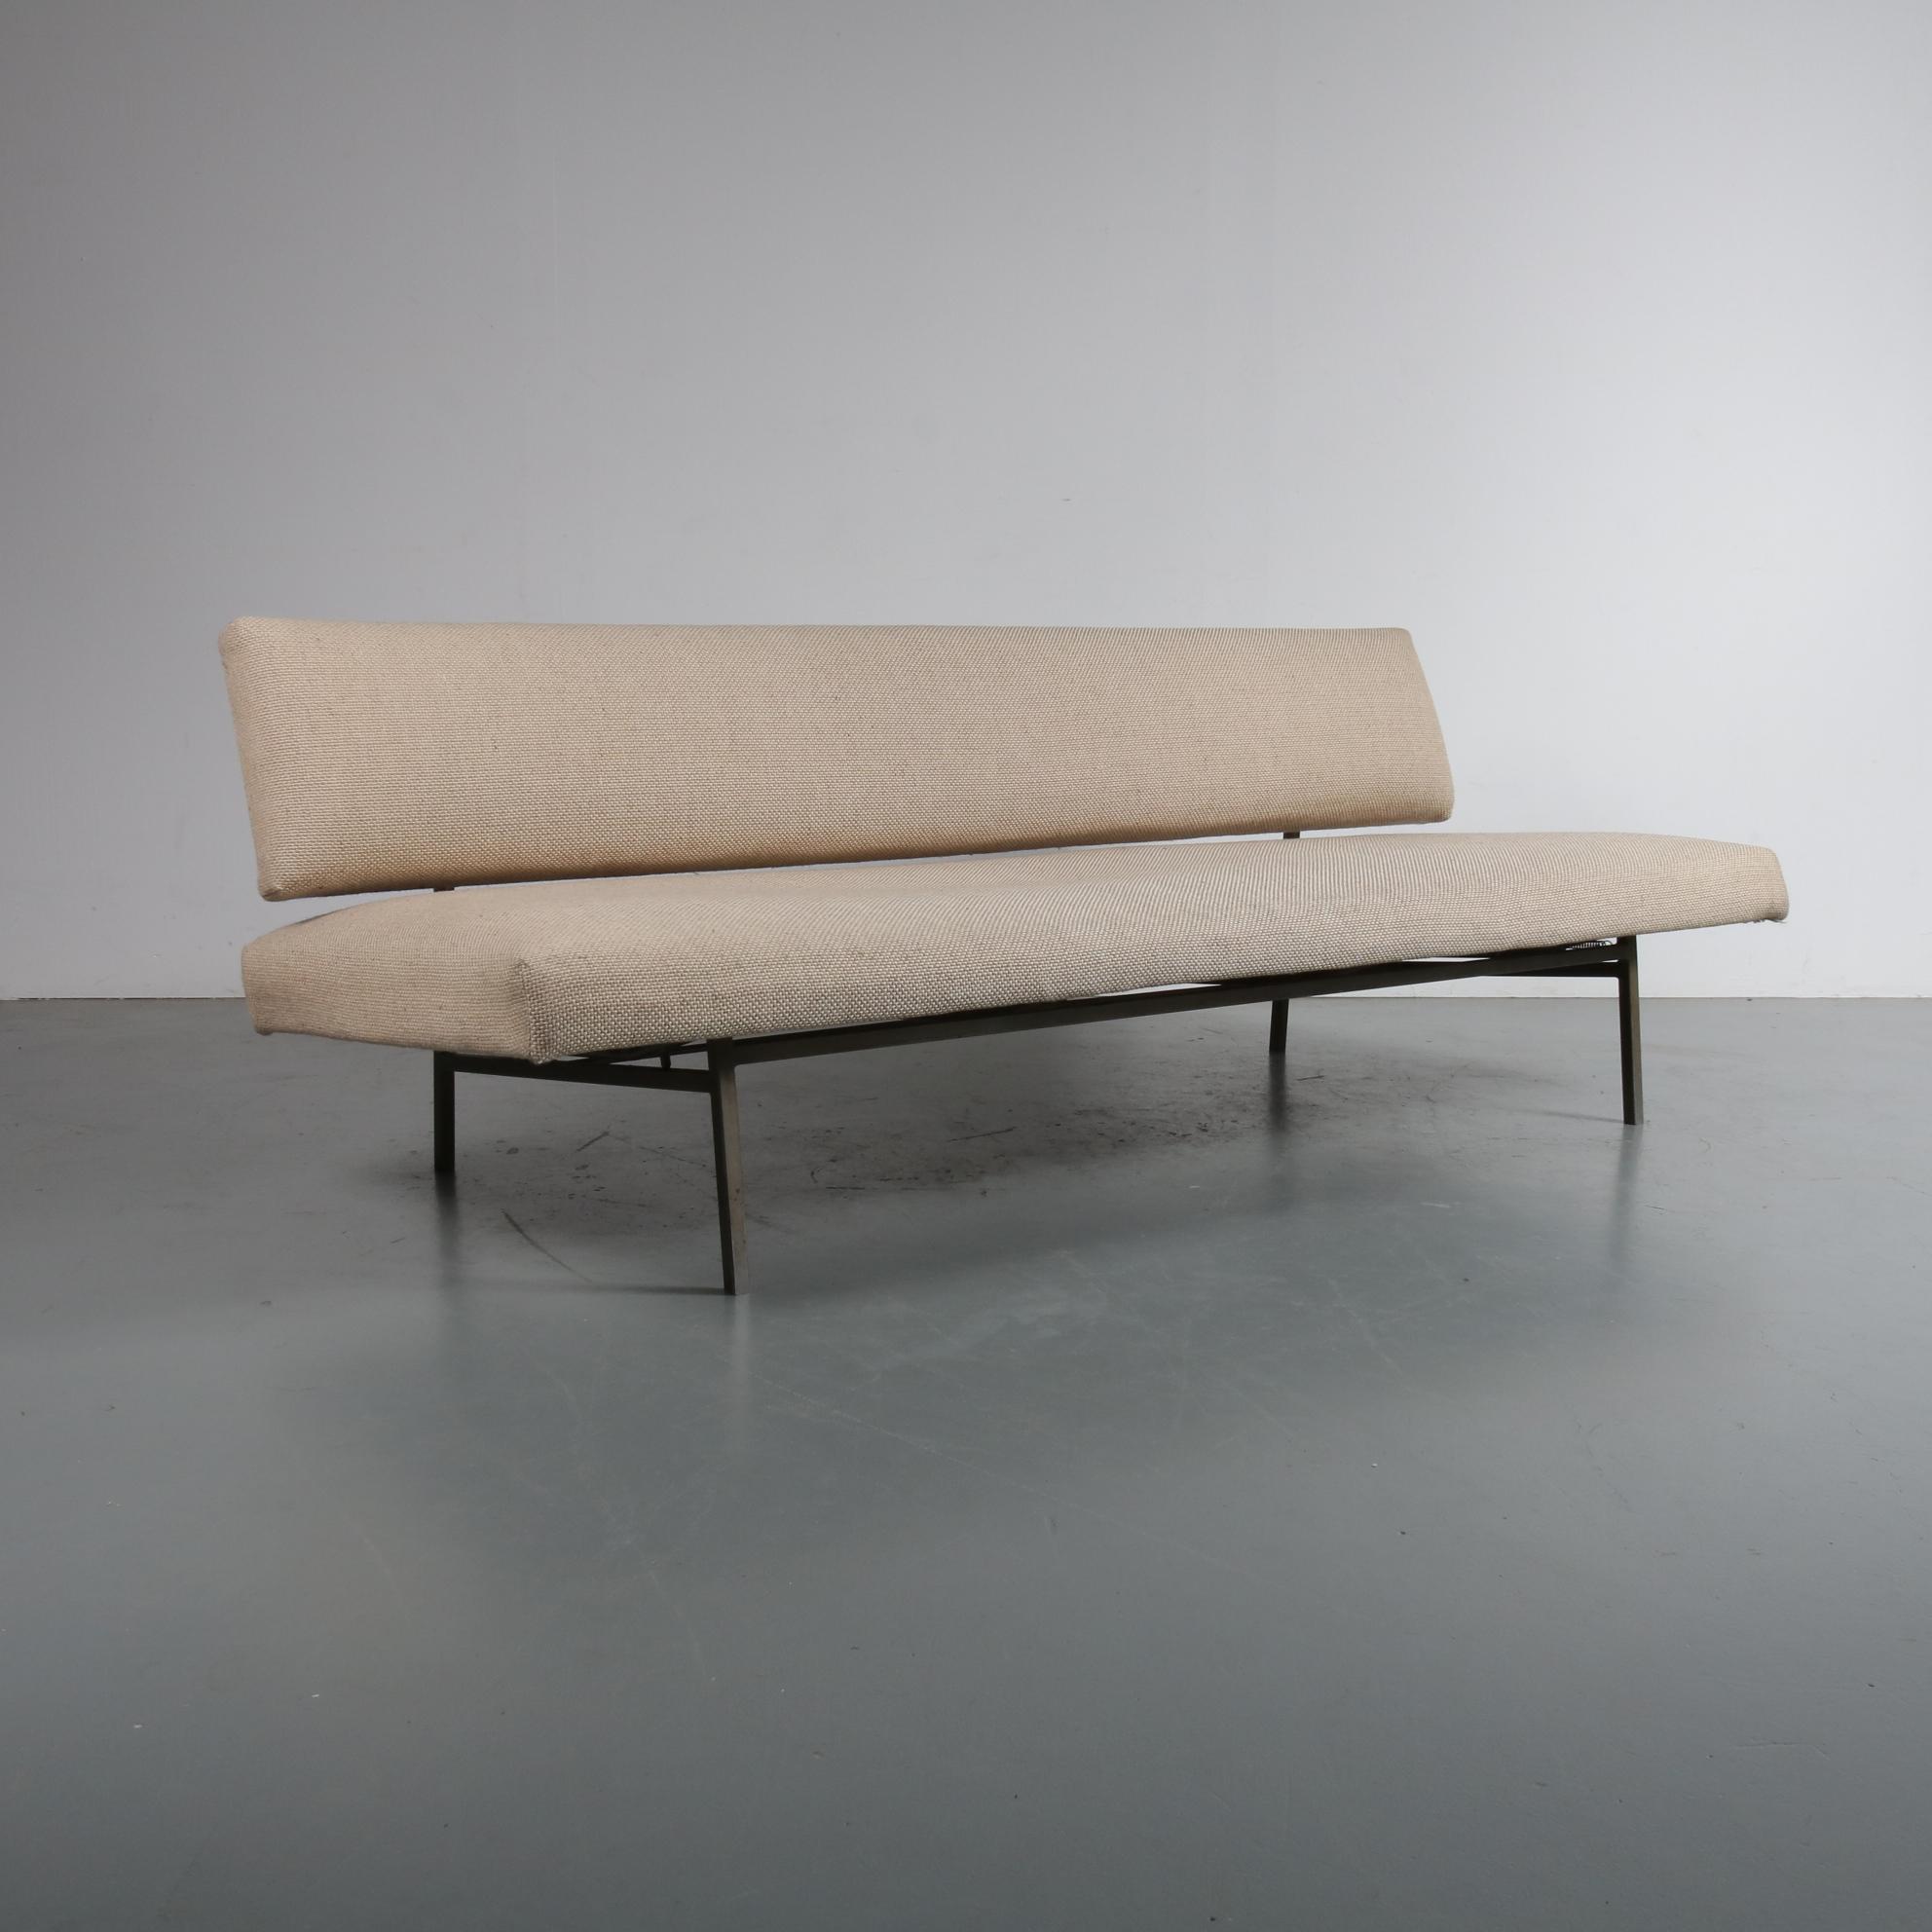 m22933 1950s Sleeping bench on grey metal base with original beige upholstery Rob Parry Gelderland / NL